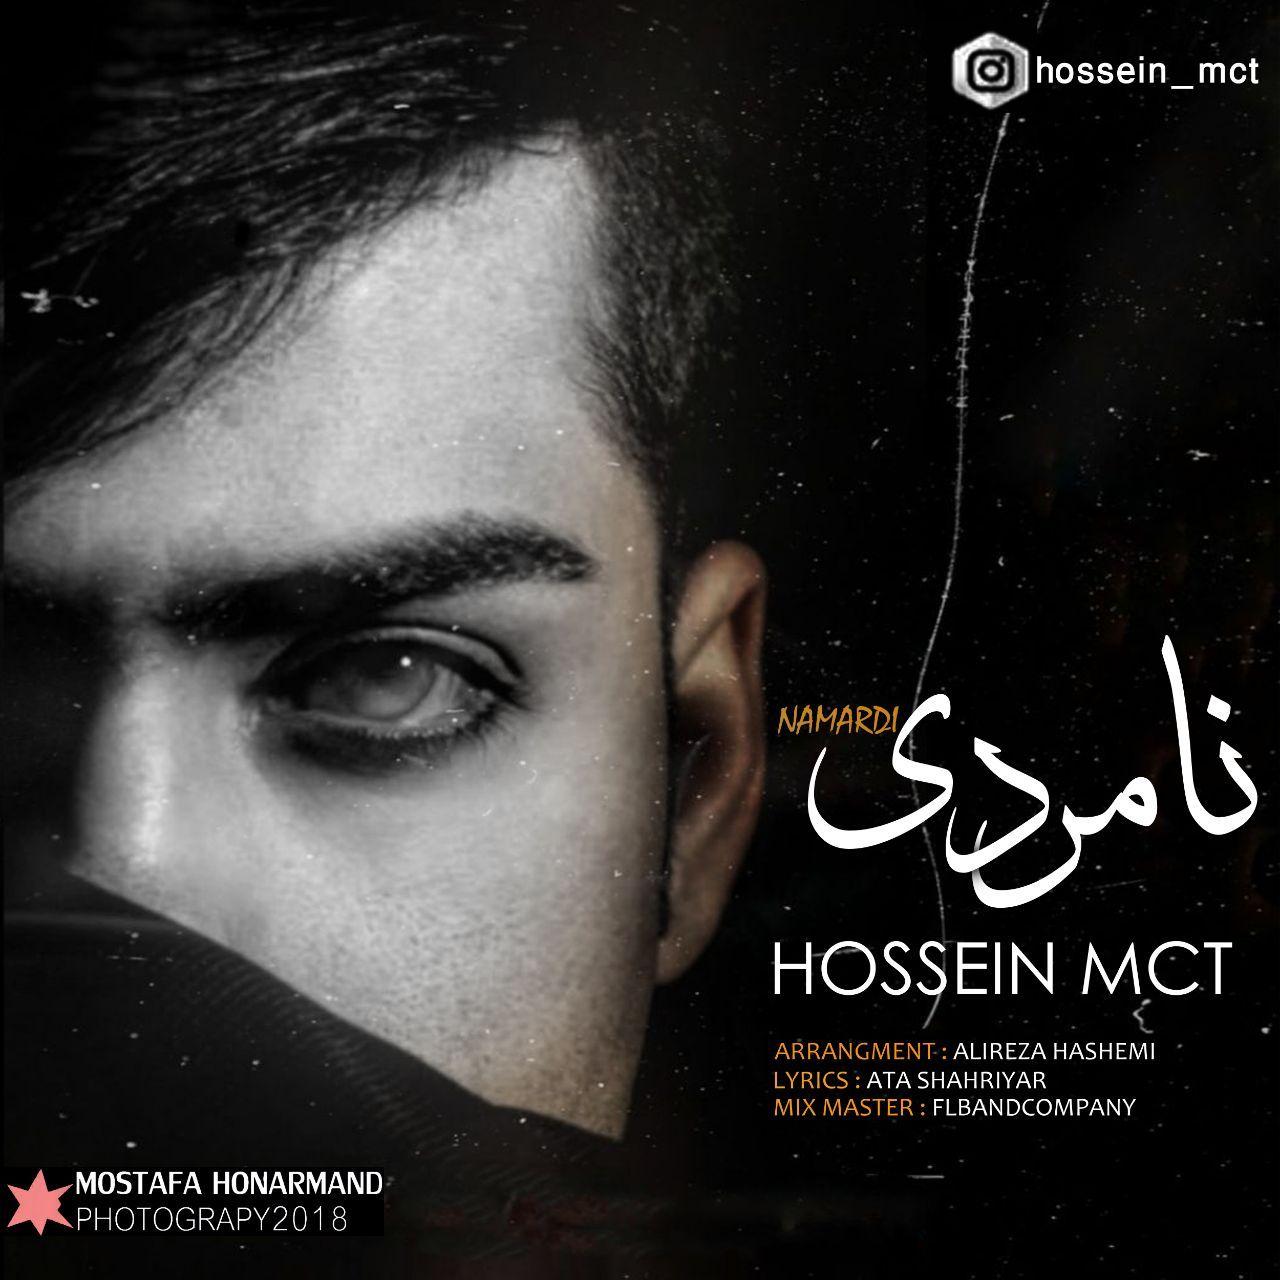 Hossein MCT – Namardi